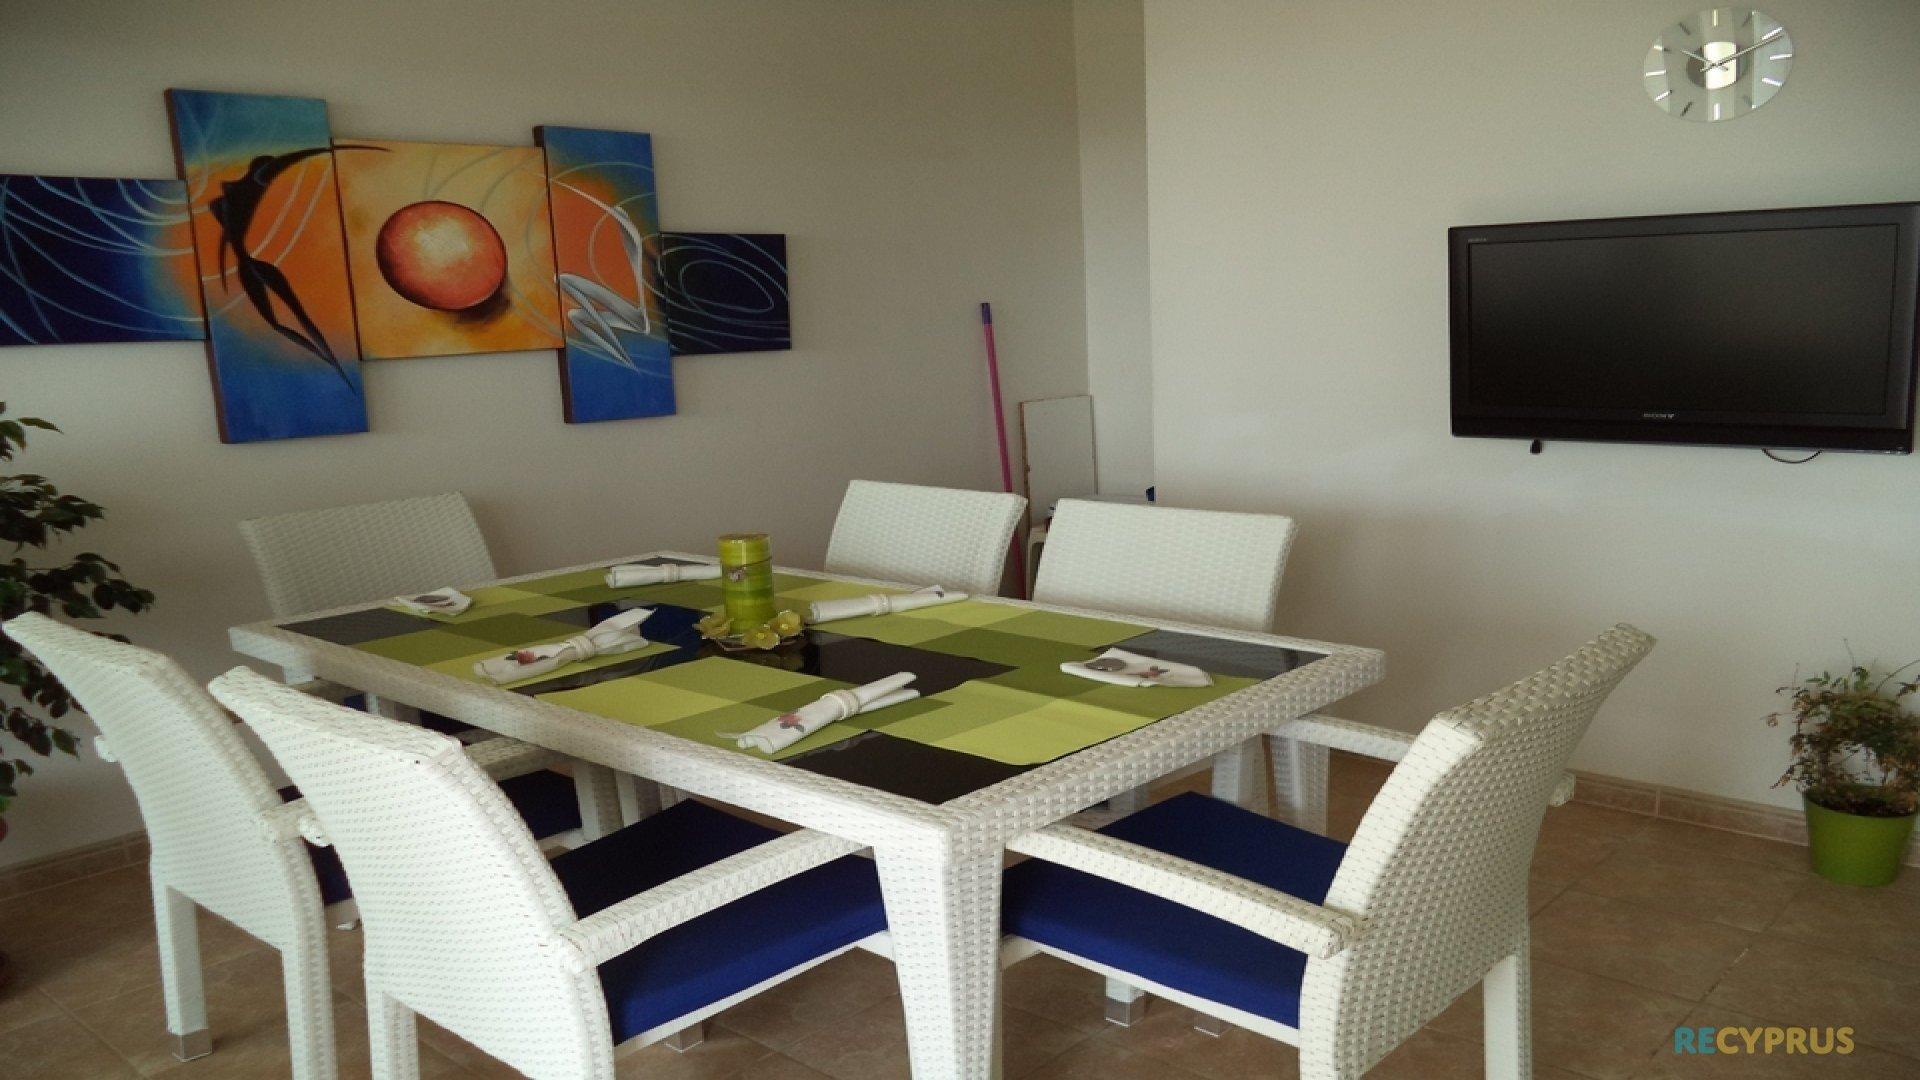 Apartment for sale Kapparis Famagusta Cyprus 11 3463